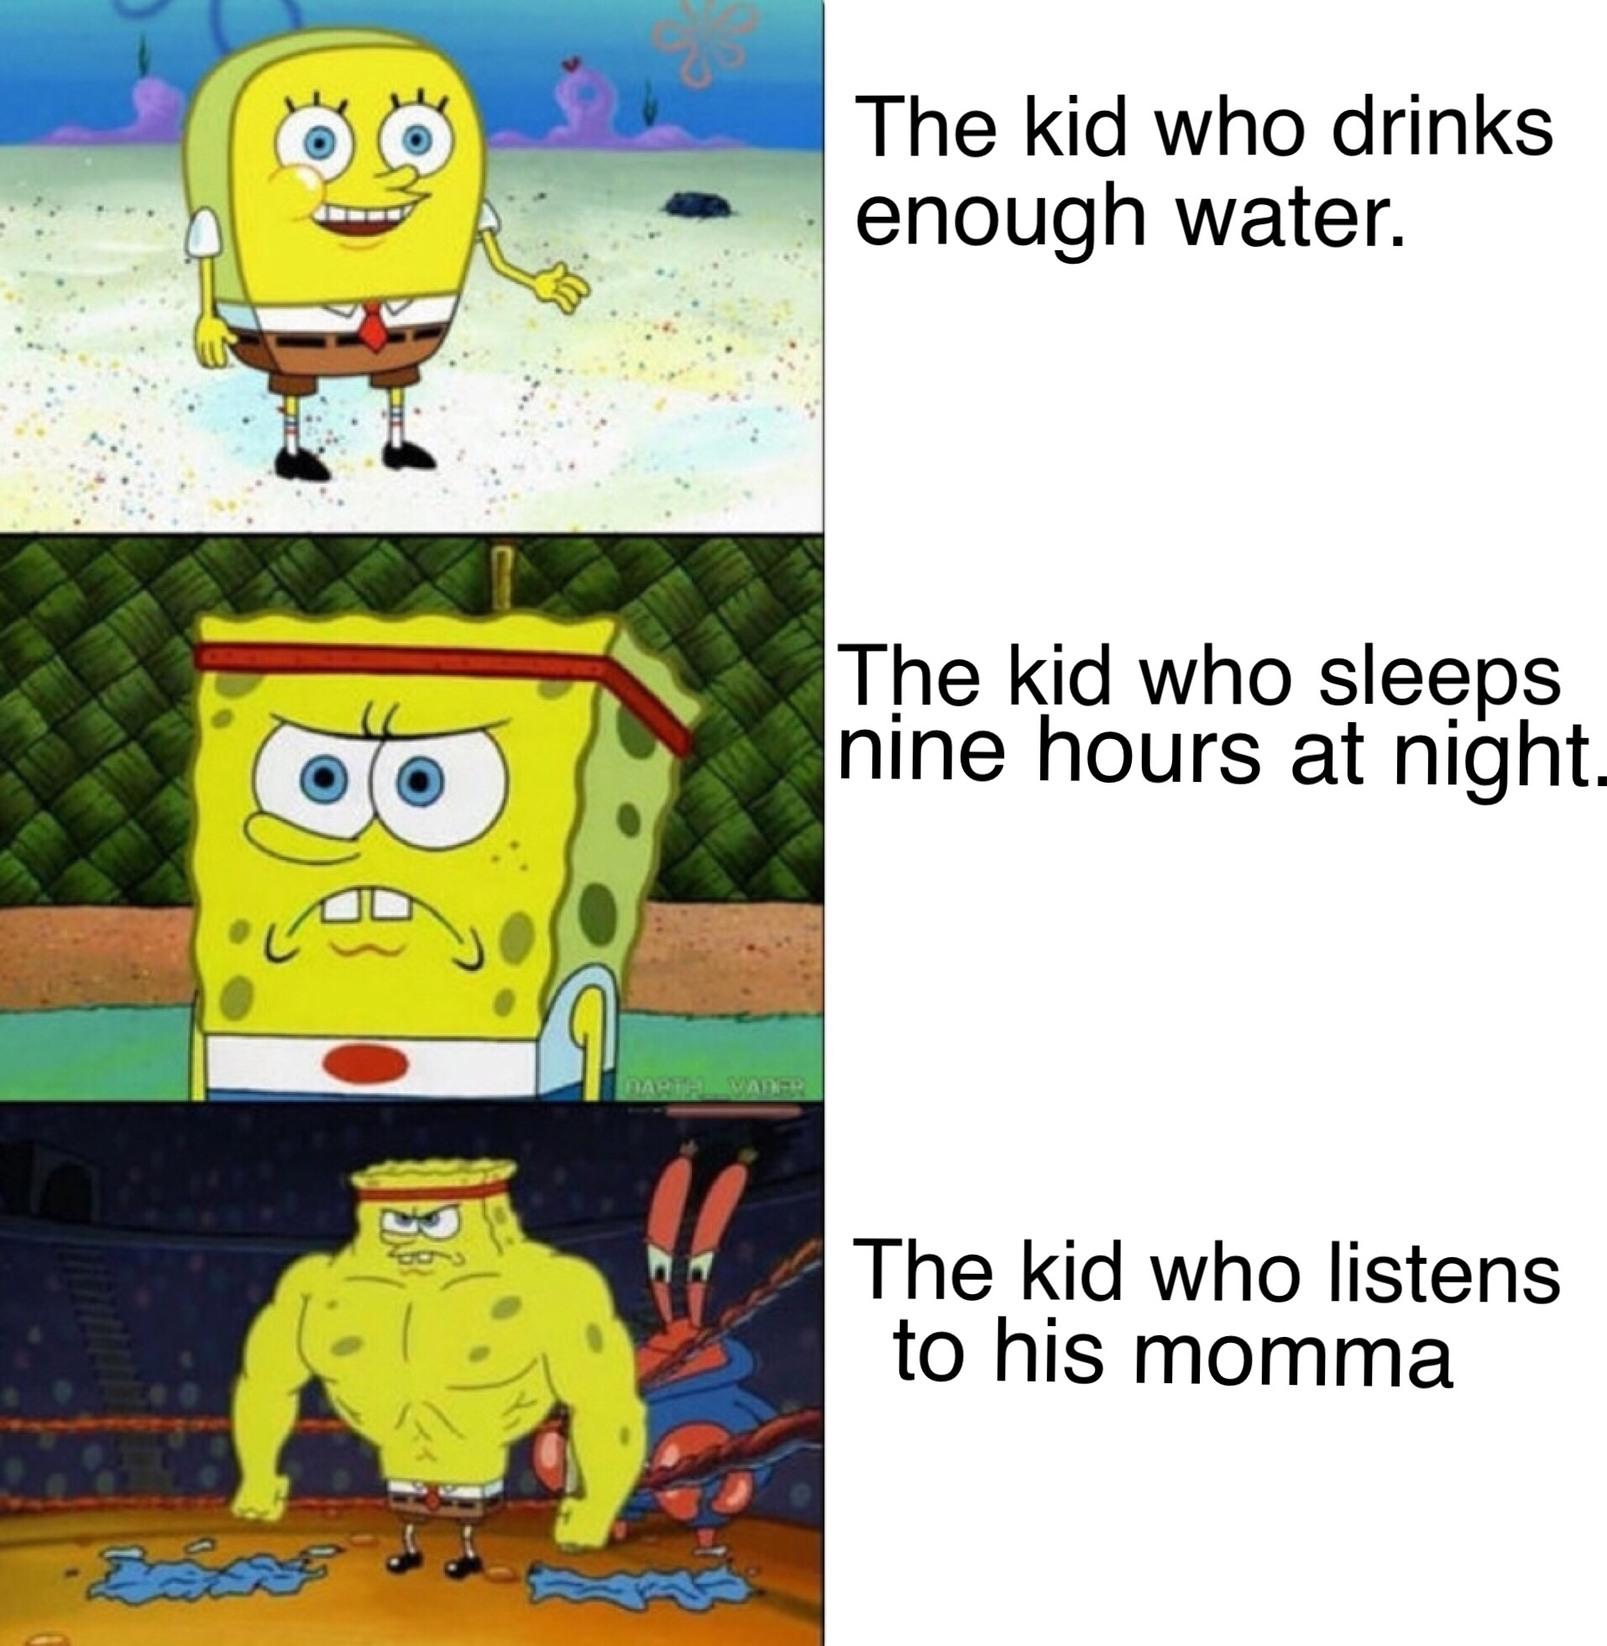 A pretty shitty meme, just like most Spongebob memes anyway.